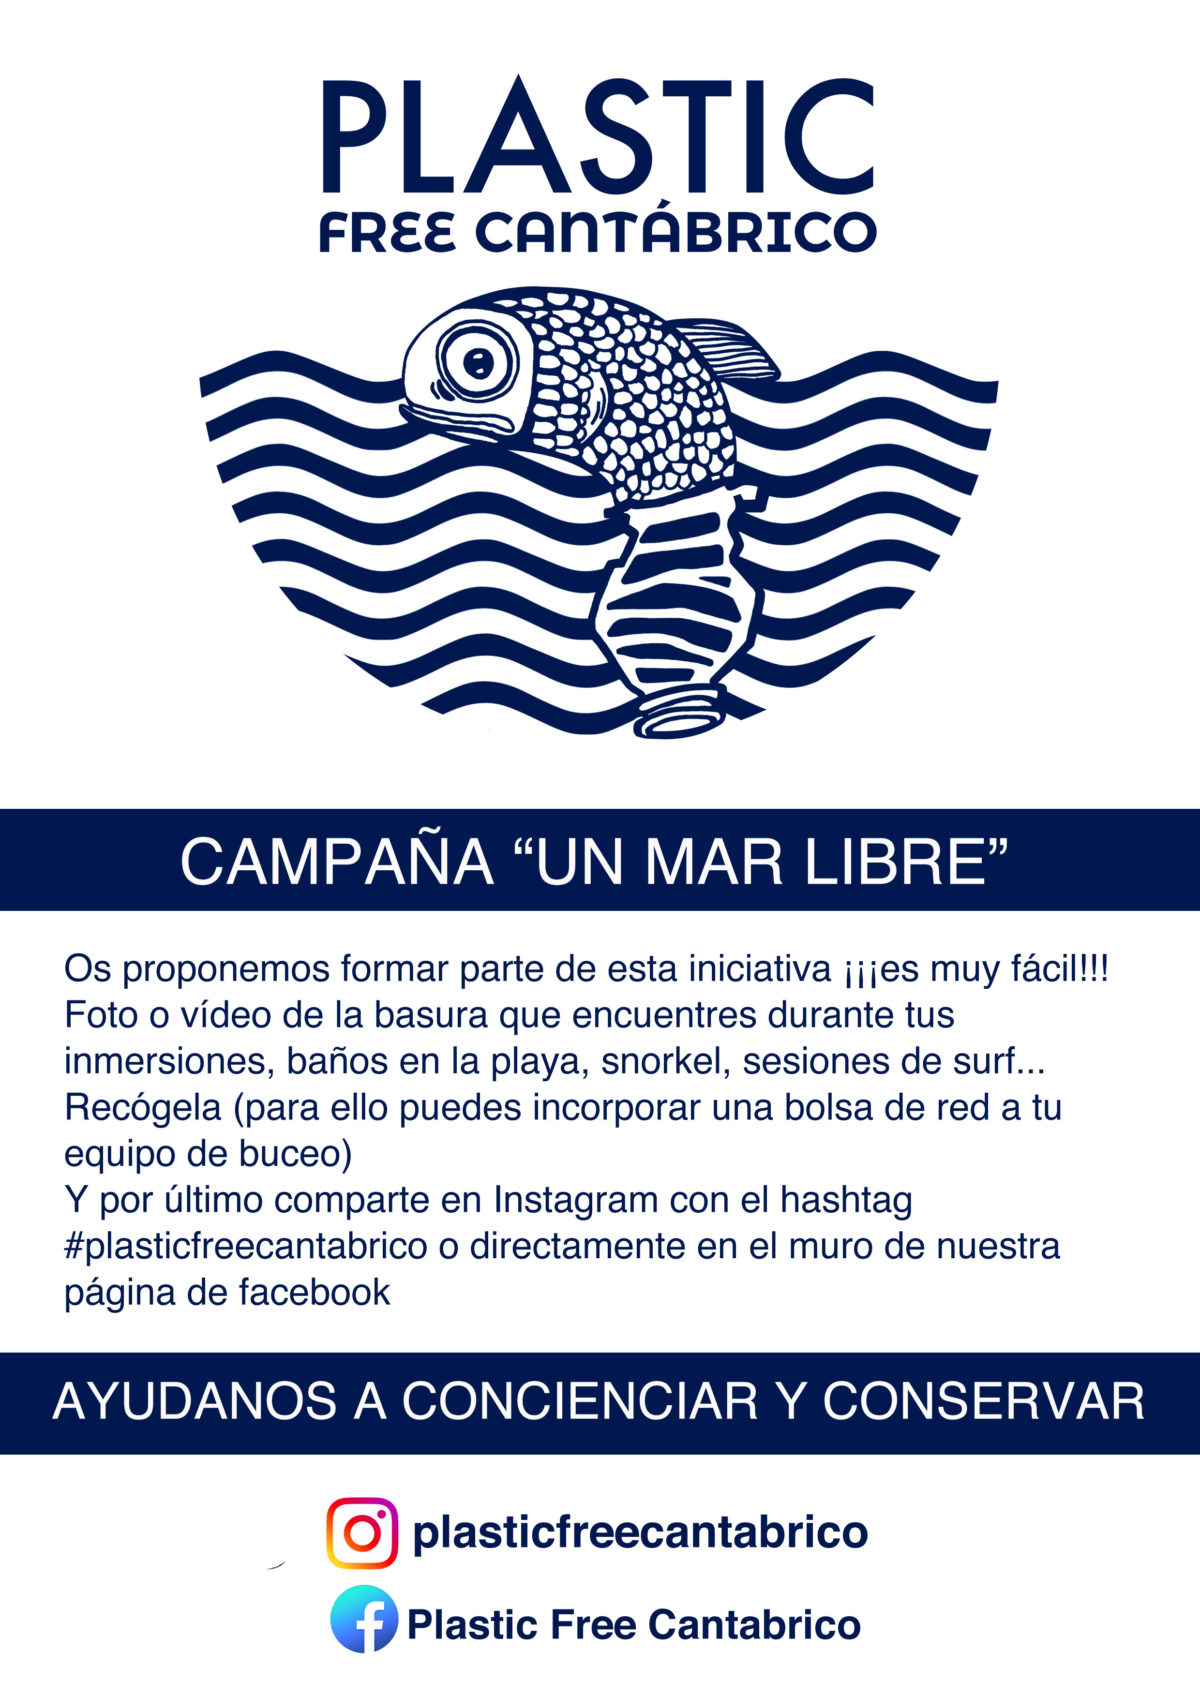 Plastic Free Cantabrico